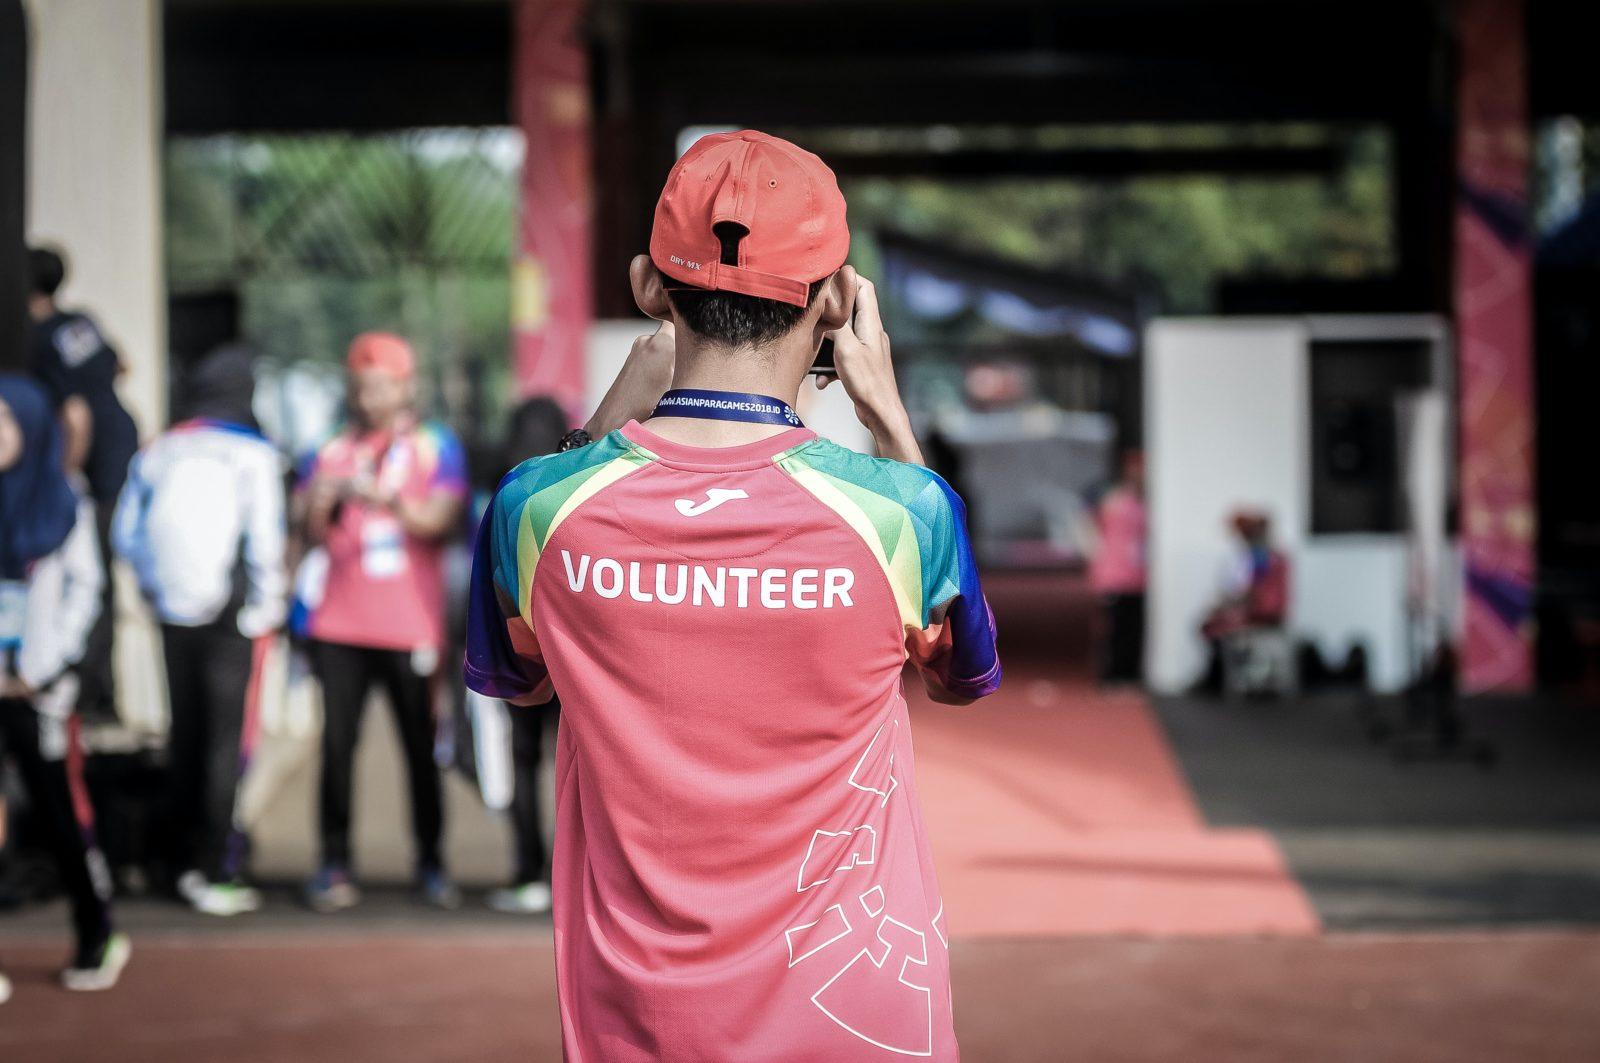 Volunteer Retention Strategies: 7 Tips to Keep Your Volunteers